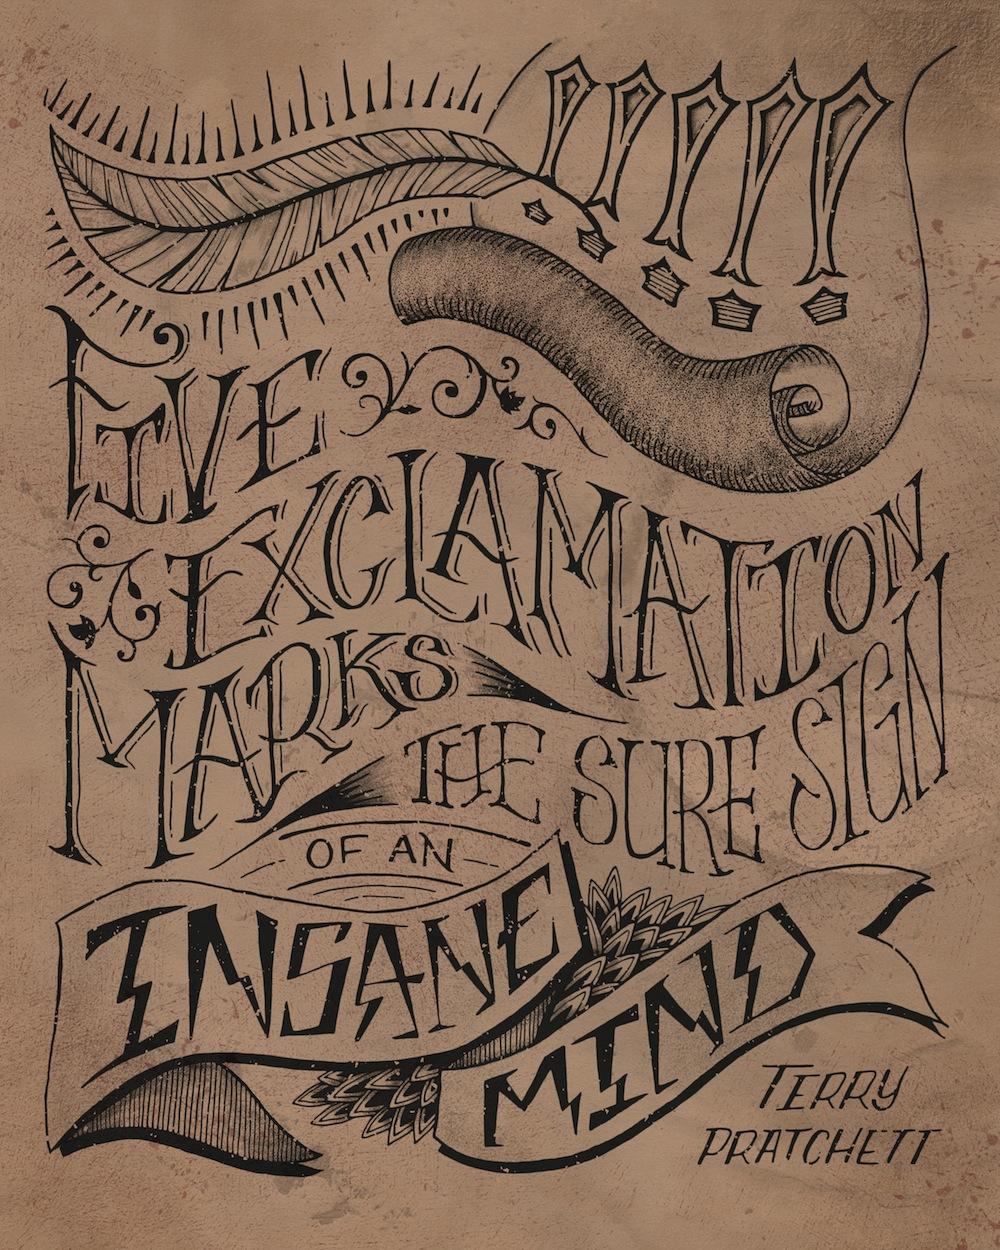 fiveexclamationmarks_artist.jpg